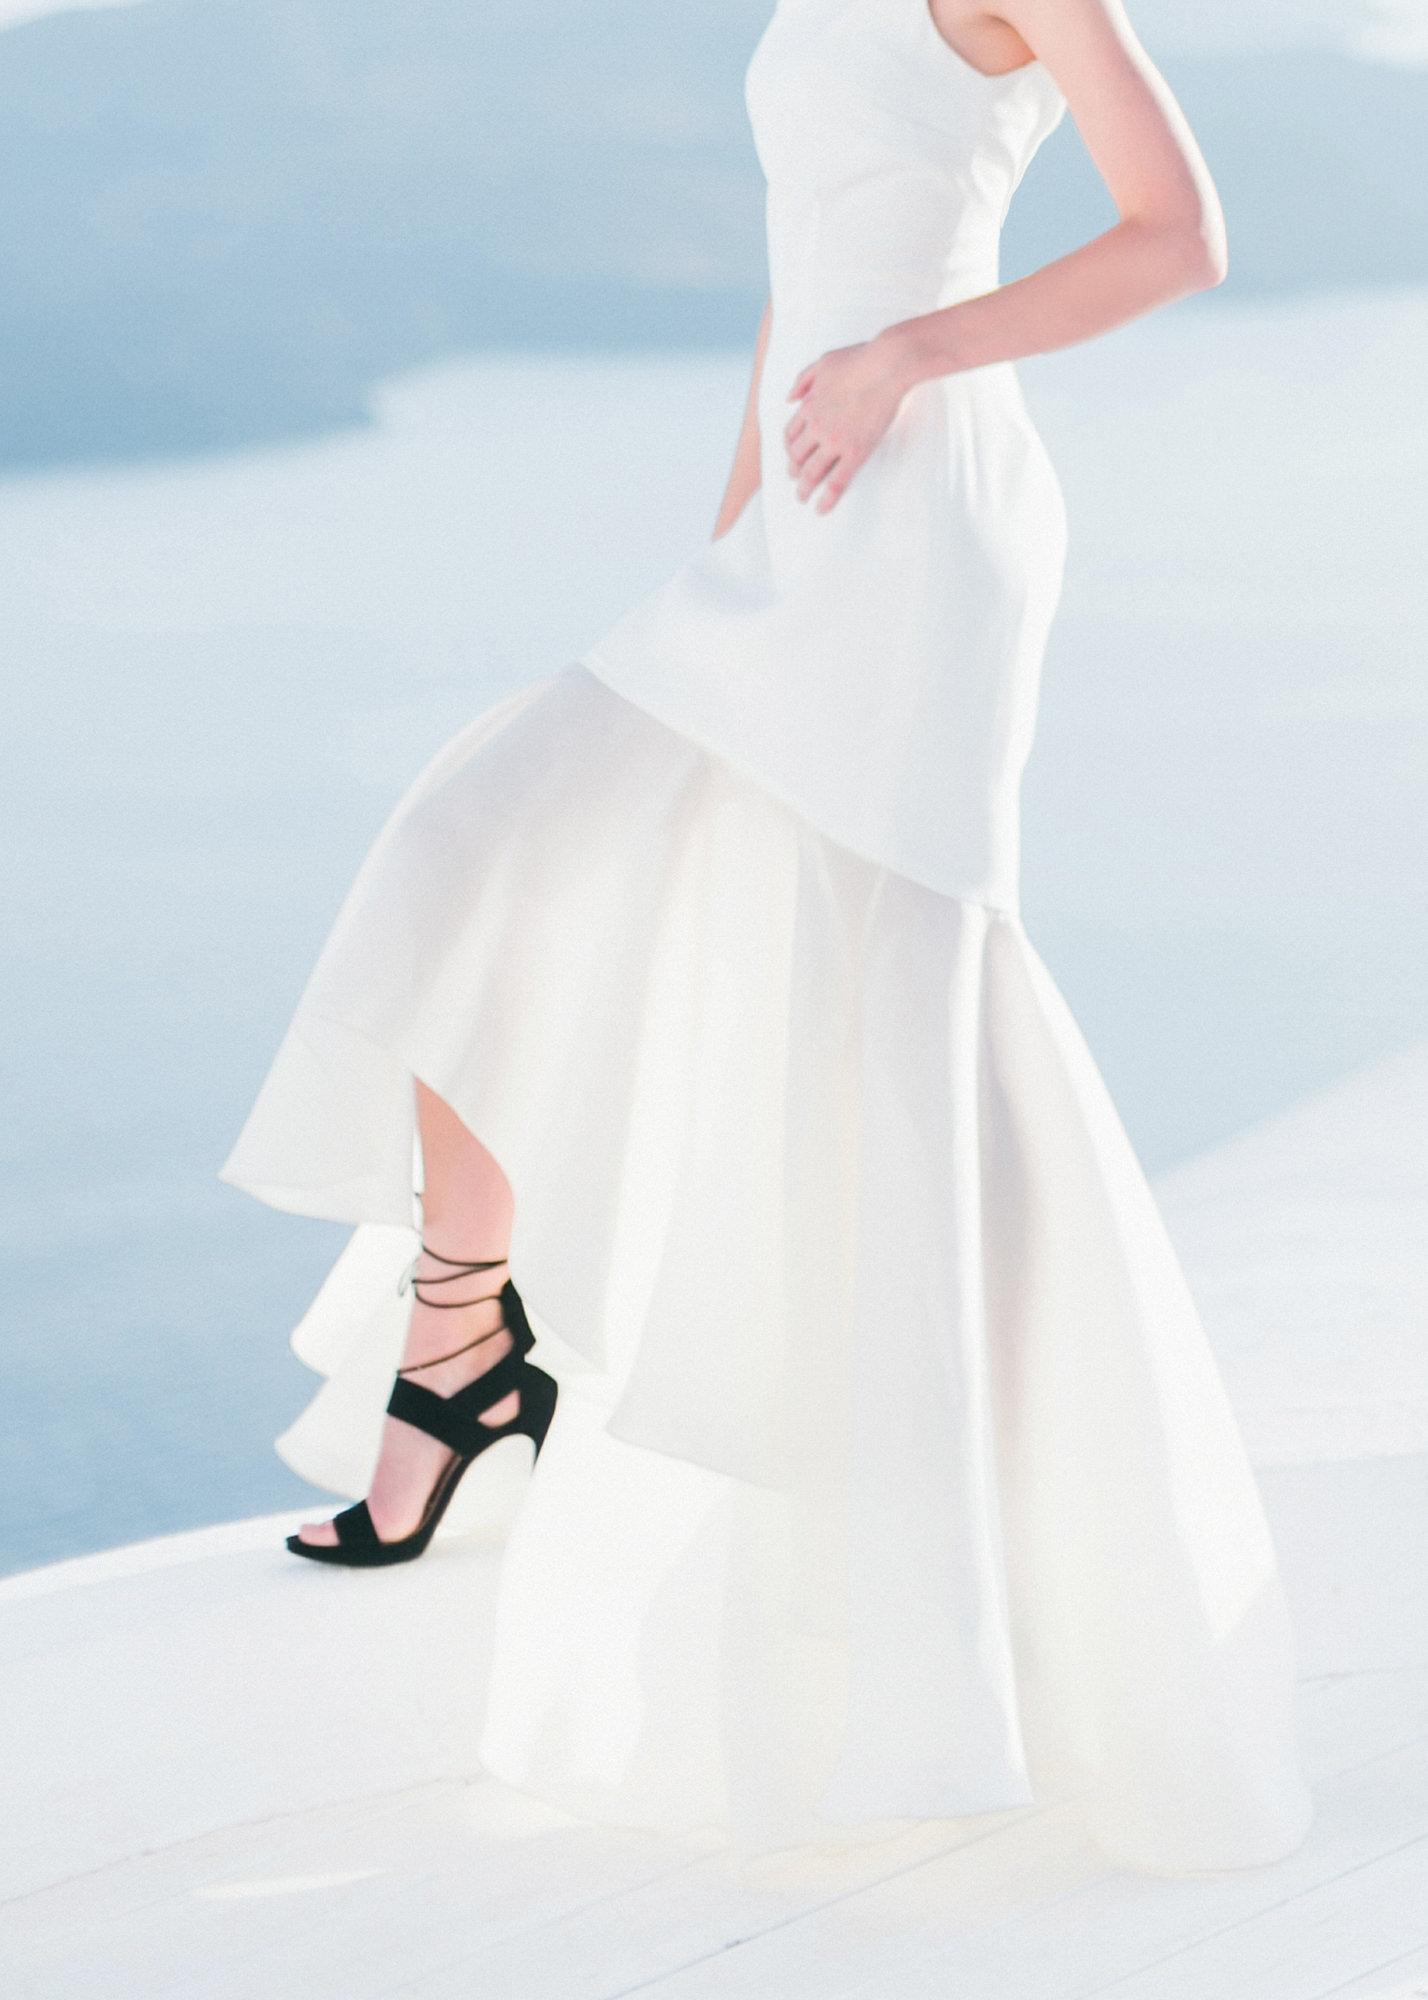 32-portrait-santorini-wedding-photographer-greece-b-v